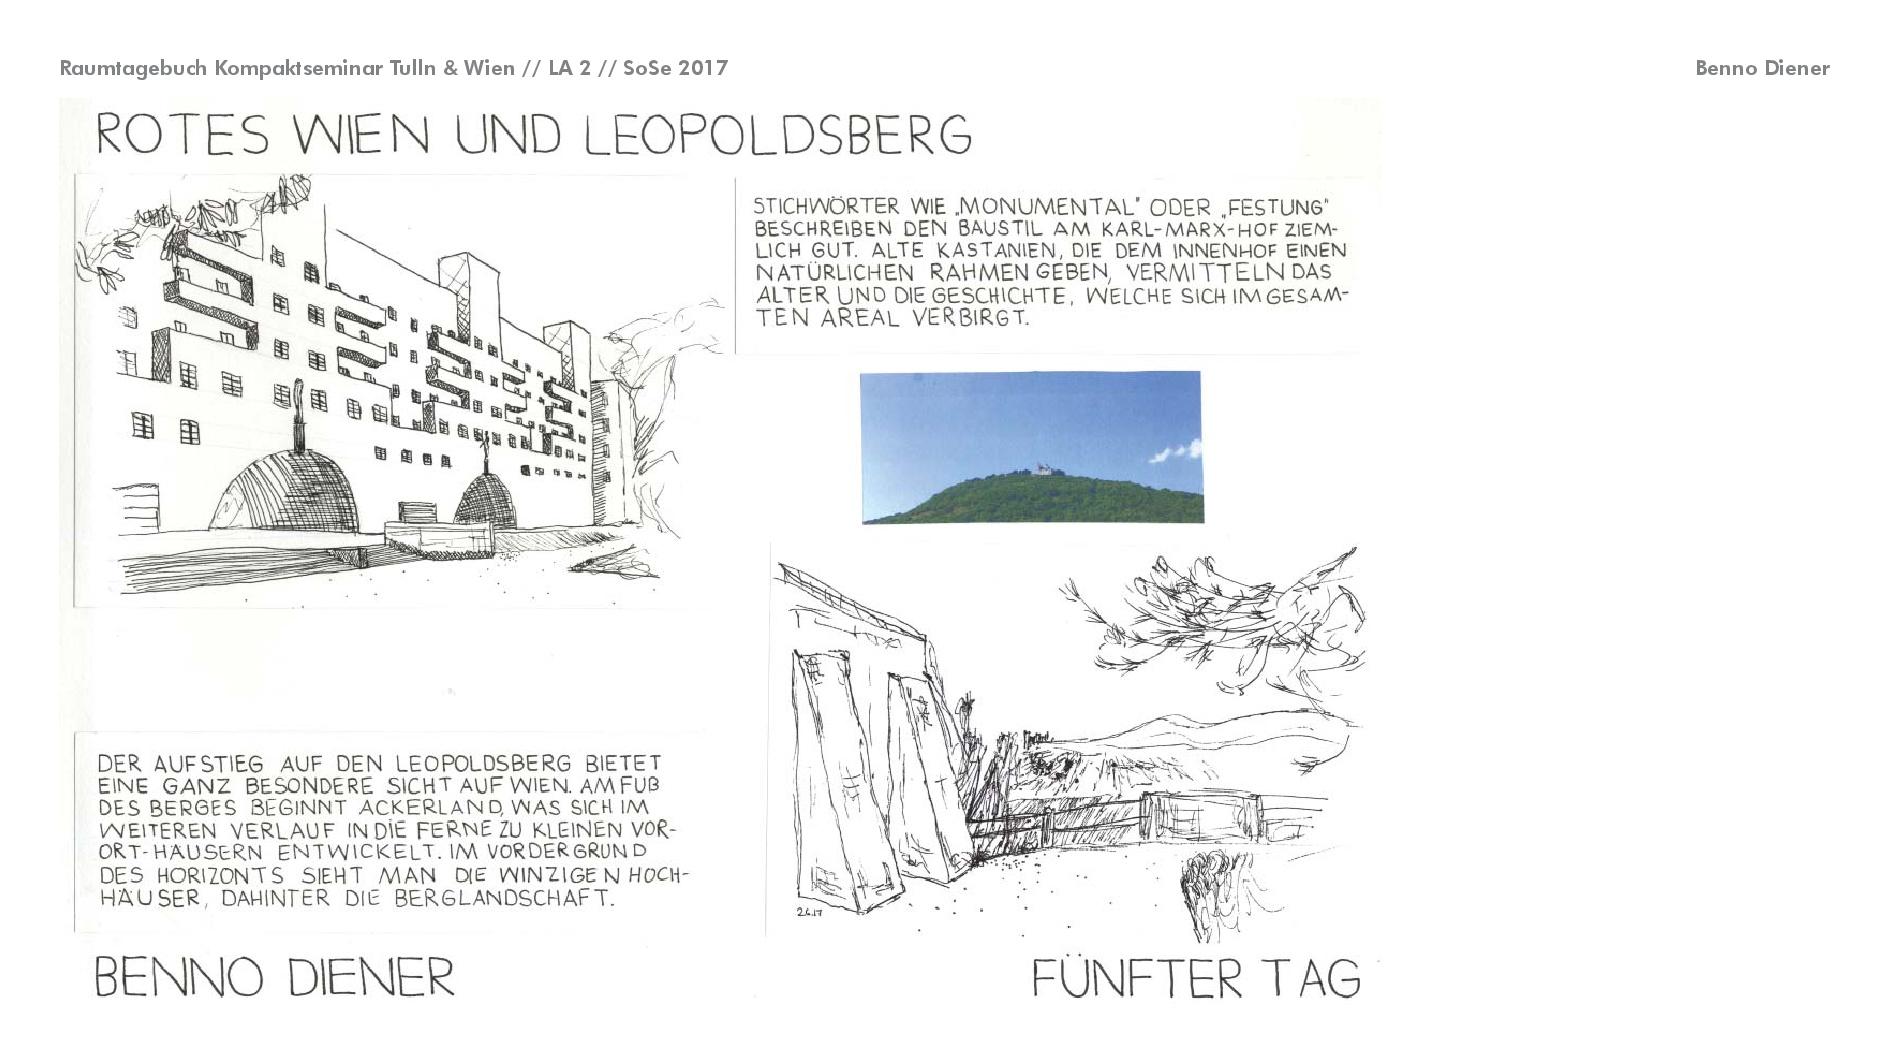 NEU Screen Raumtagebuch Tulln Wien SoSe 17 011